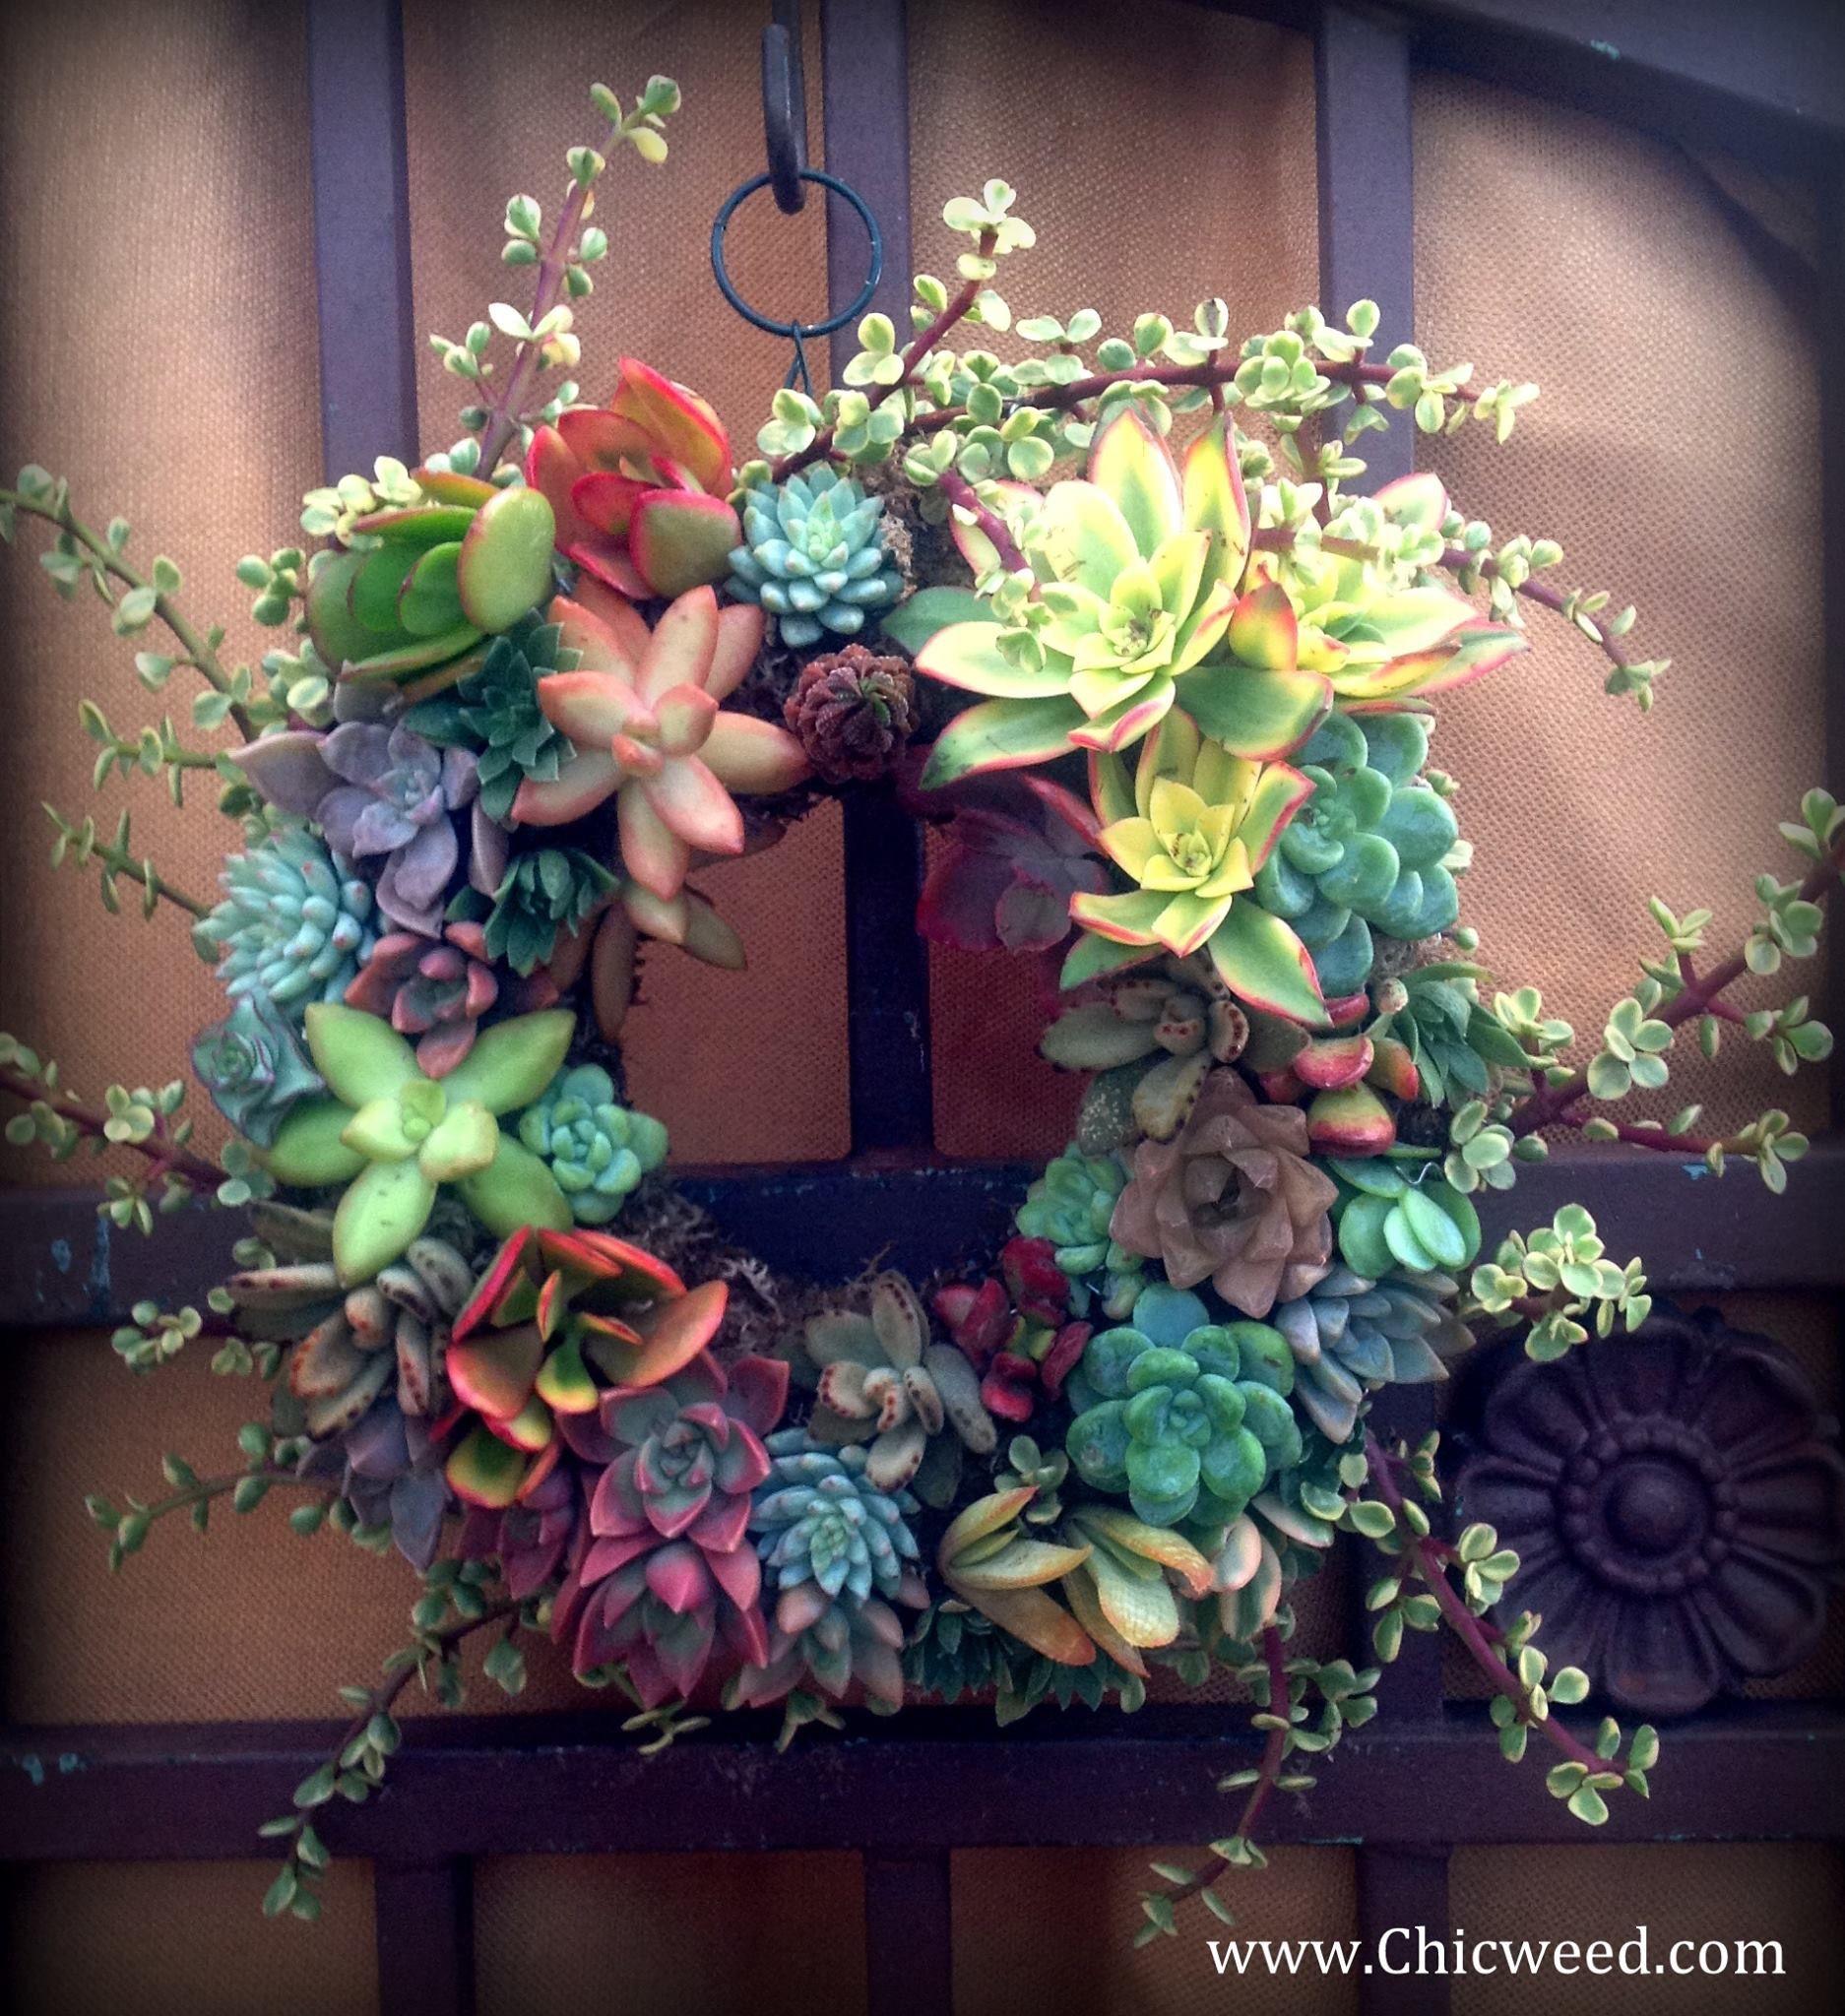 Diy Succulent Potting Mix Australia: Chicweed: Container Gardens, Landscape Design, Mosaic